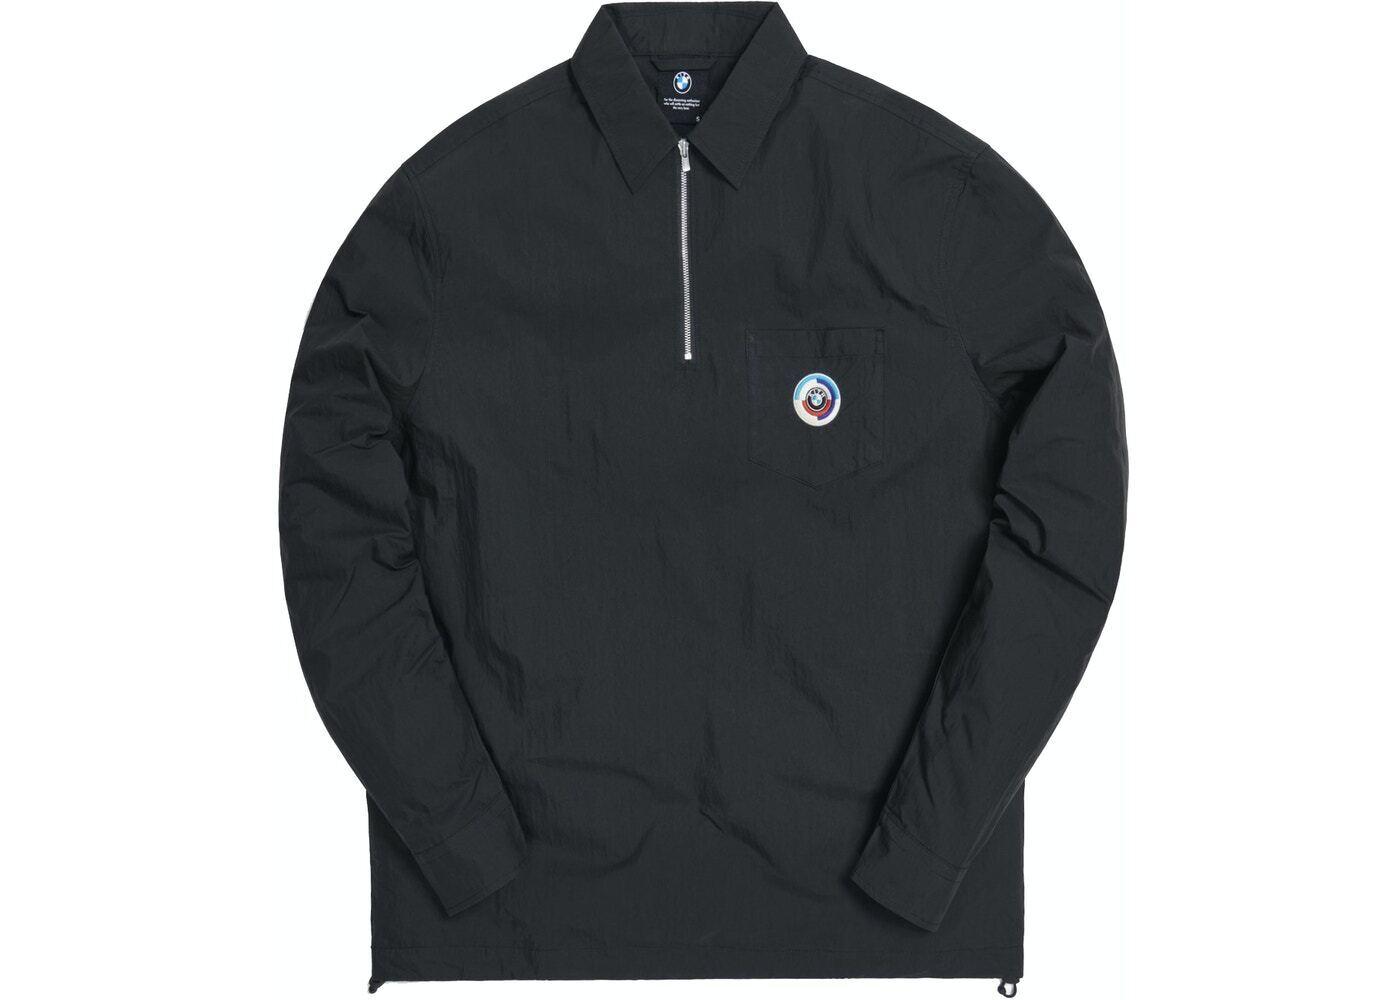 Kith x BMW Quarter Zip Collared Shirt Blackの写真